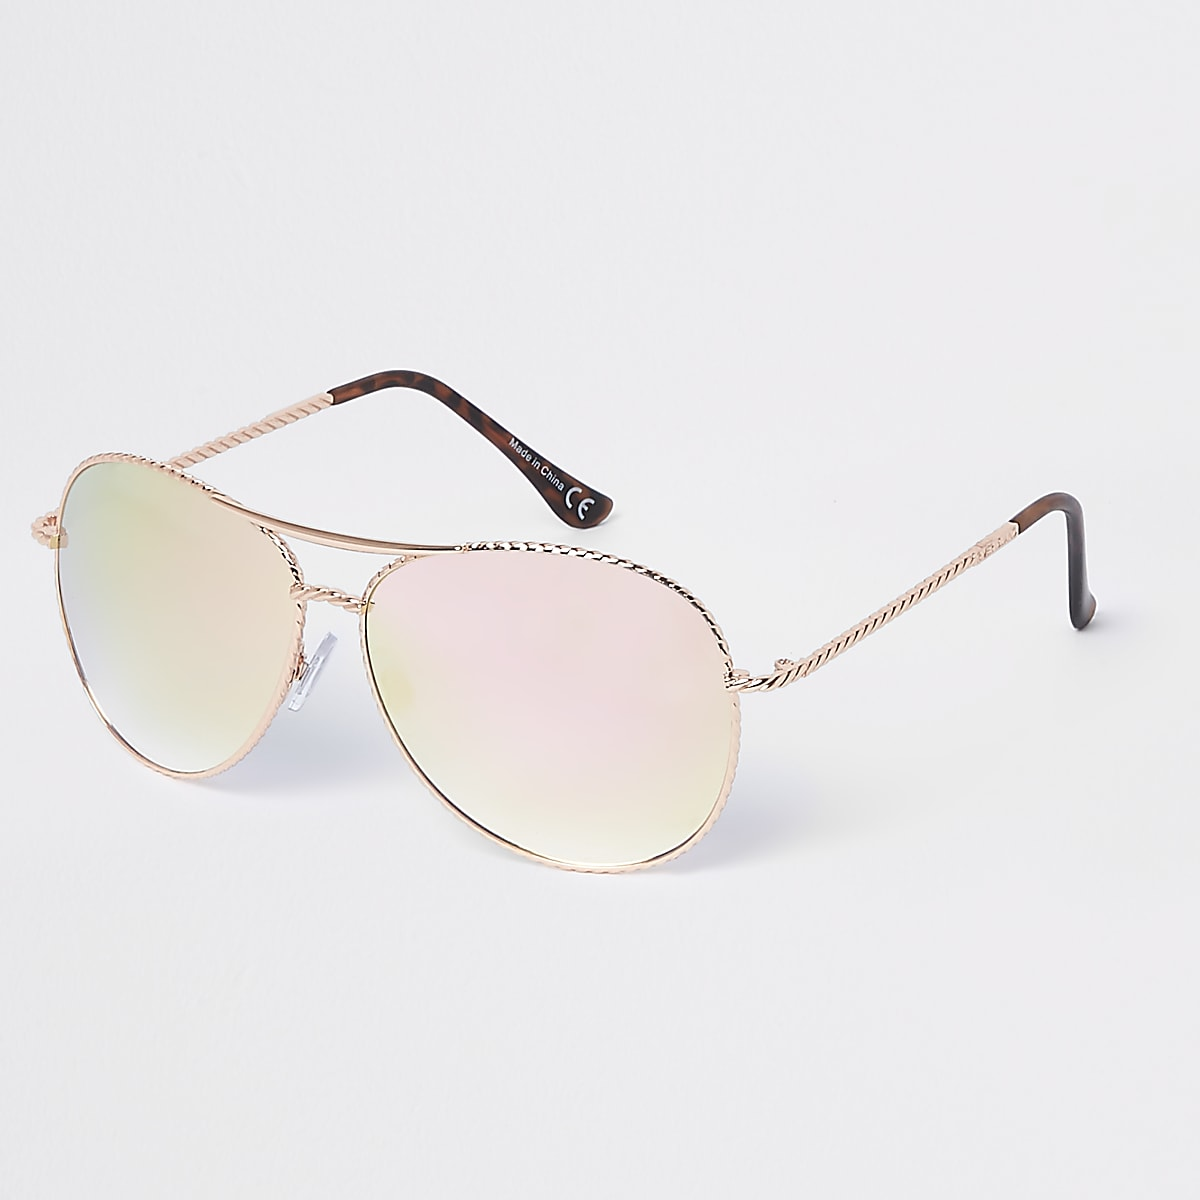 8e5e15d0c27 Rose gold twisted mirror aviator sunglasses - Aviator Sunglasses ...